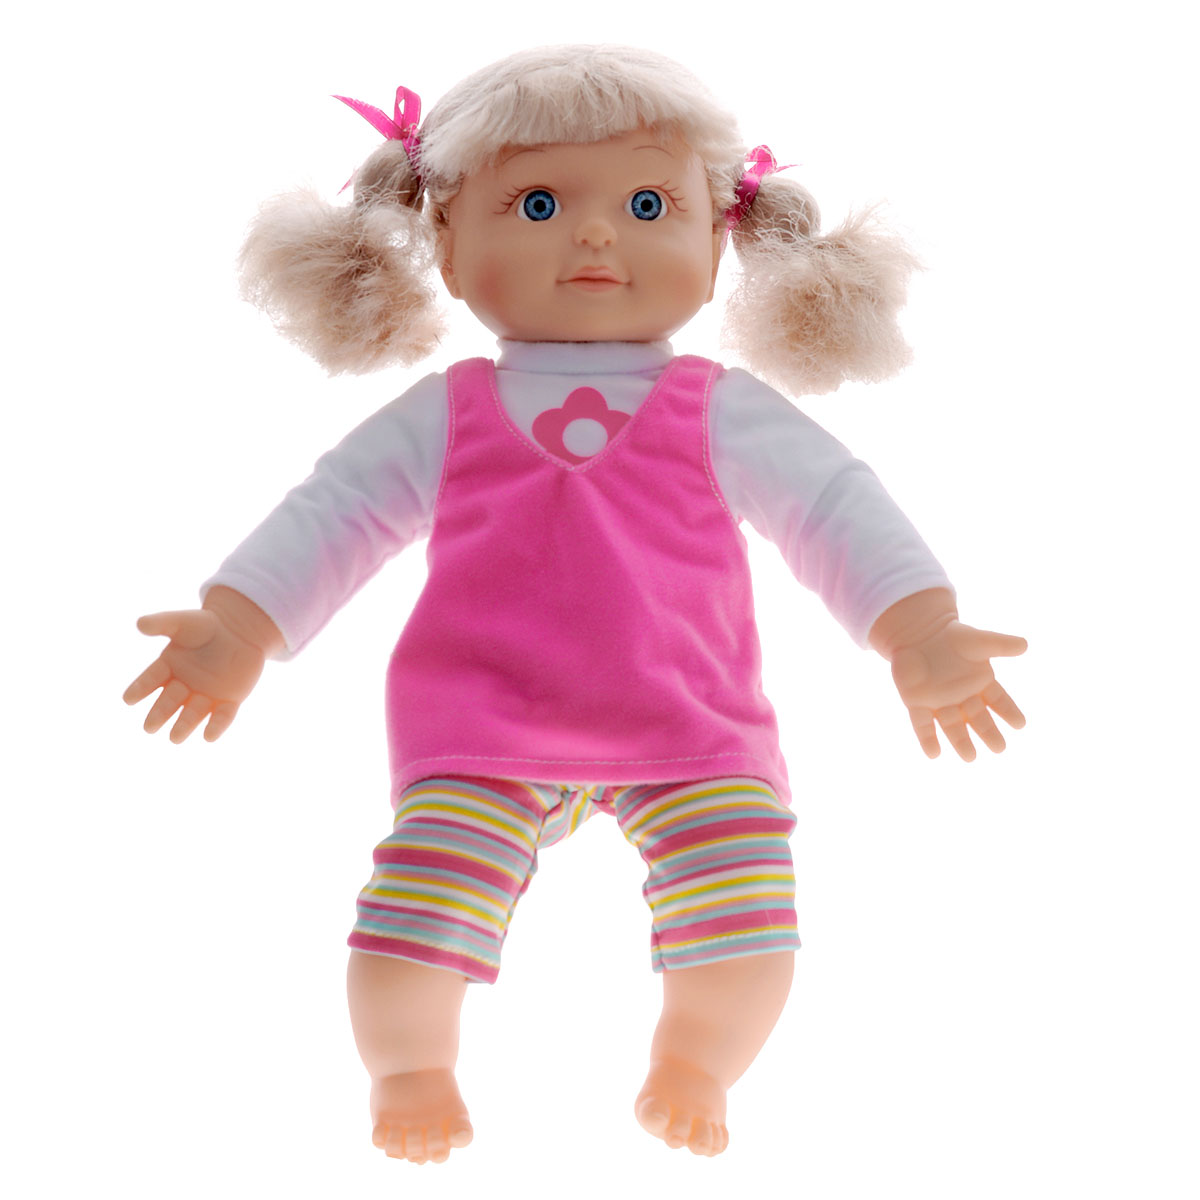 Mary Poppins Интерактивная кукла  Алена Я учу части тела, 38 см куклы mary poppins кукла функциональная 30см